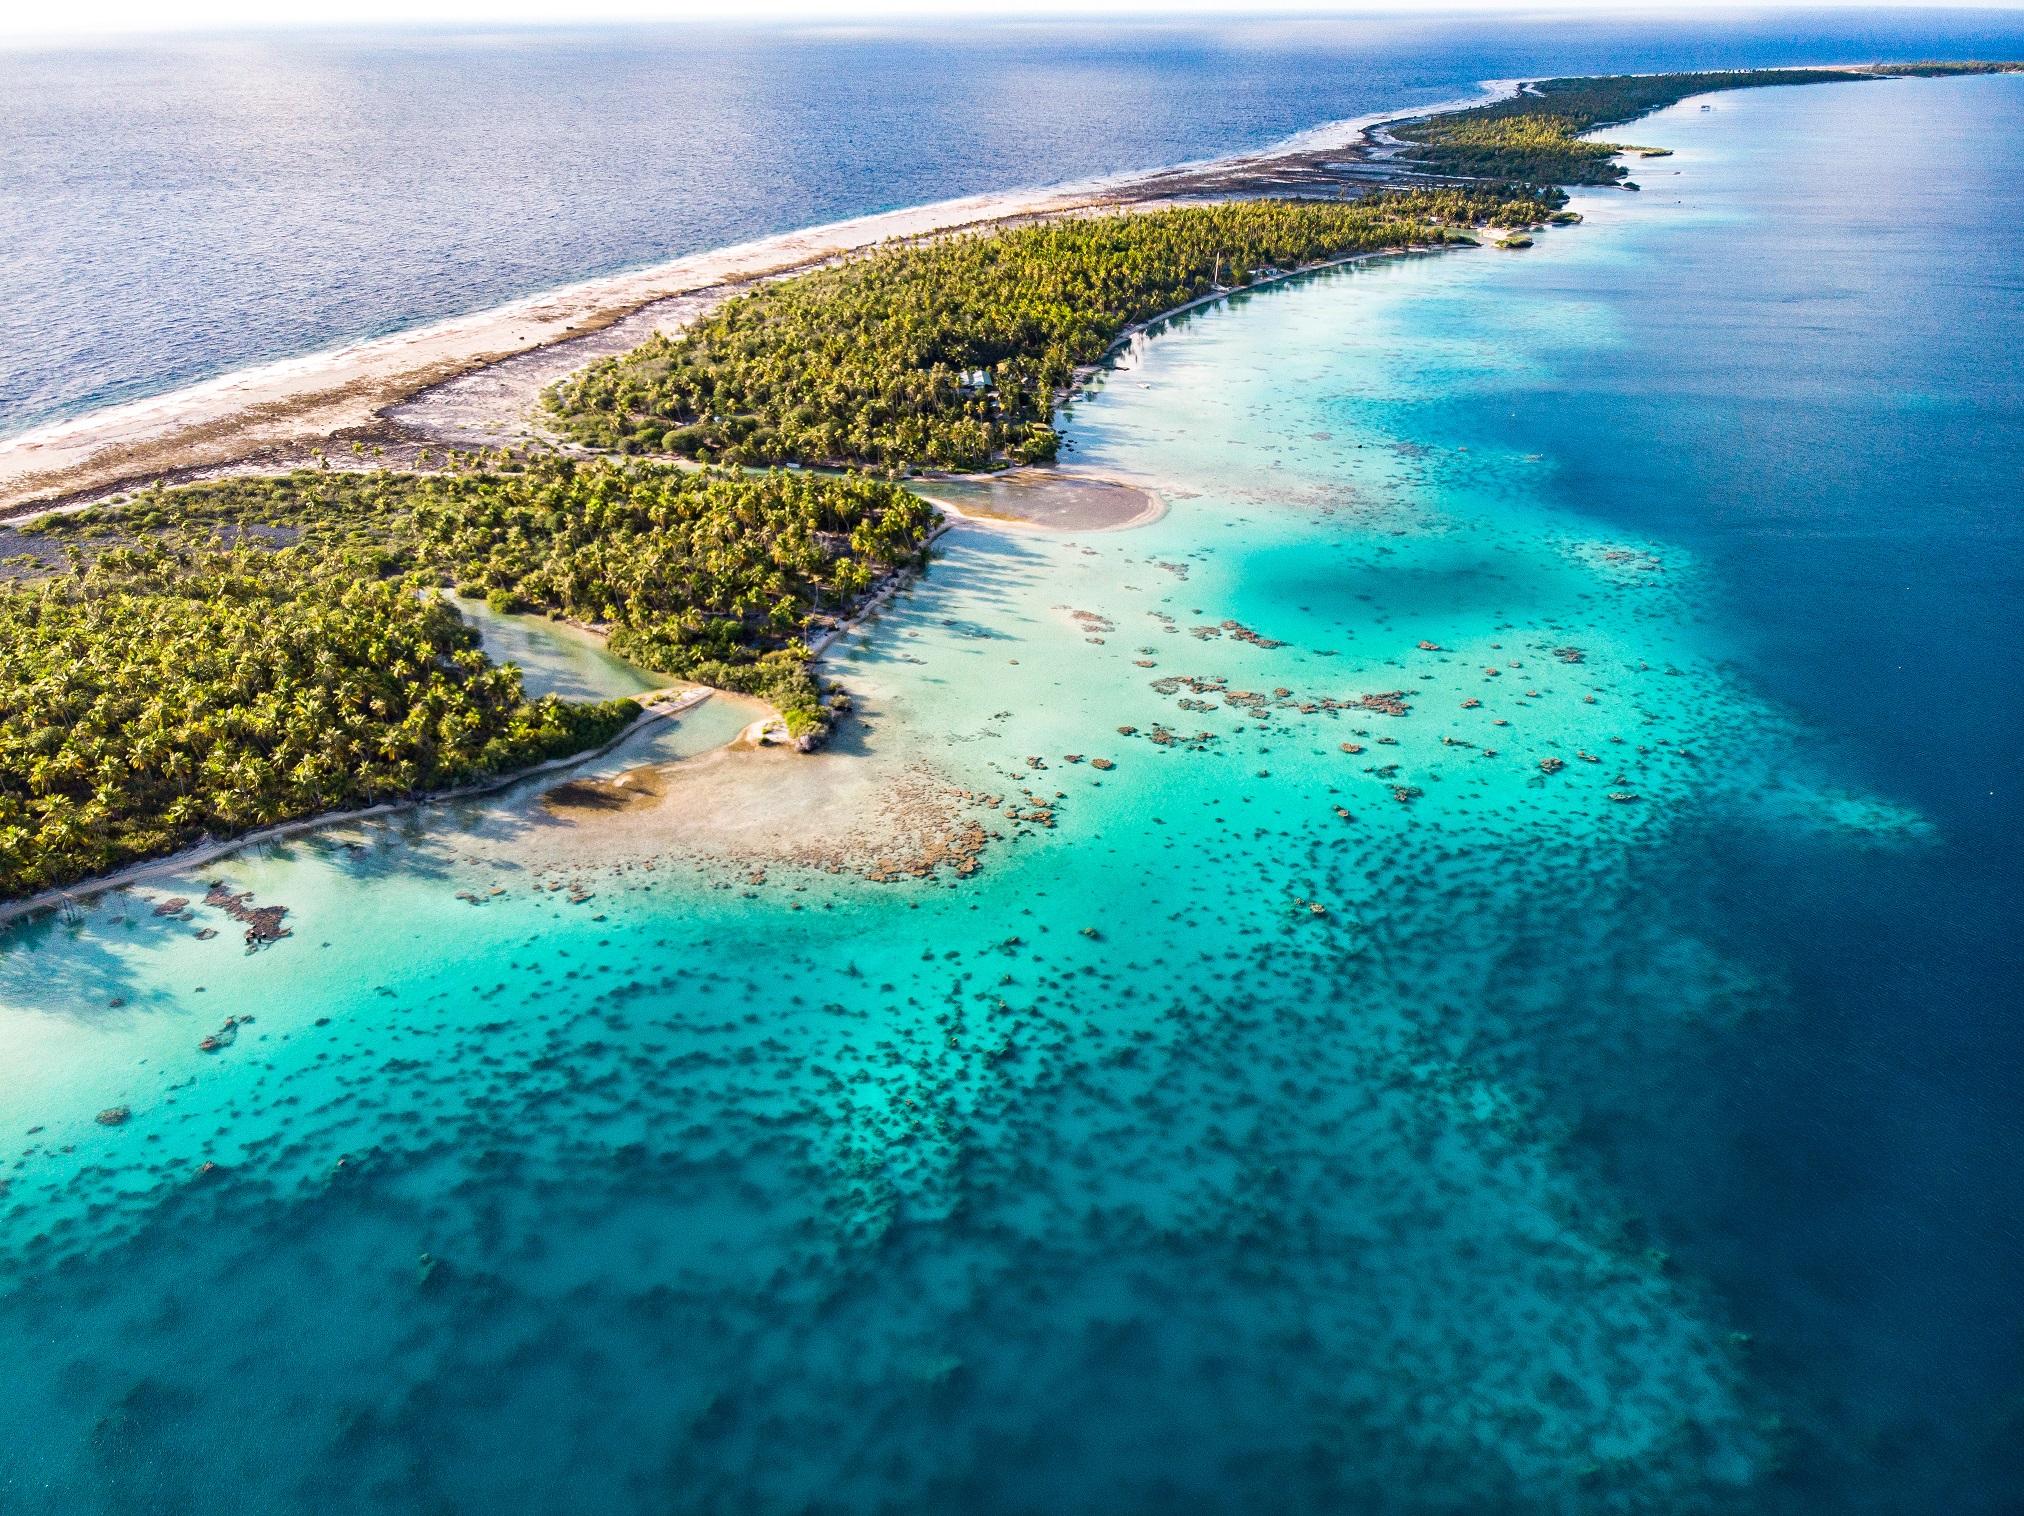 tuamotu islands ahe ahe